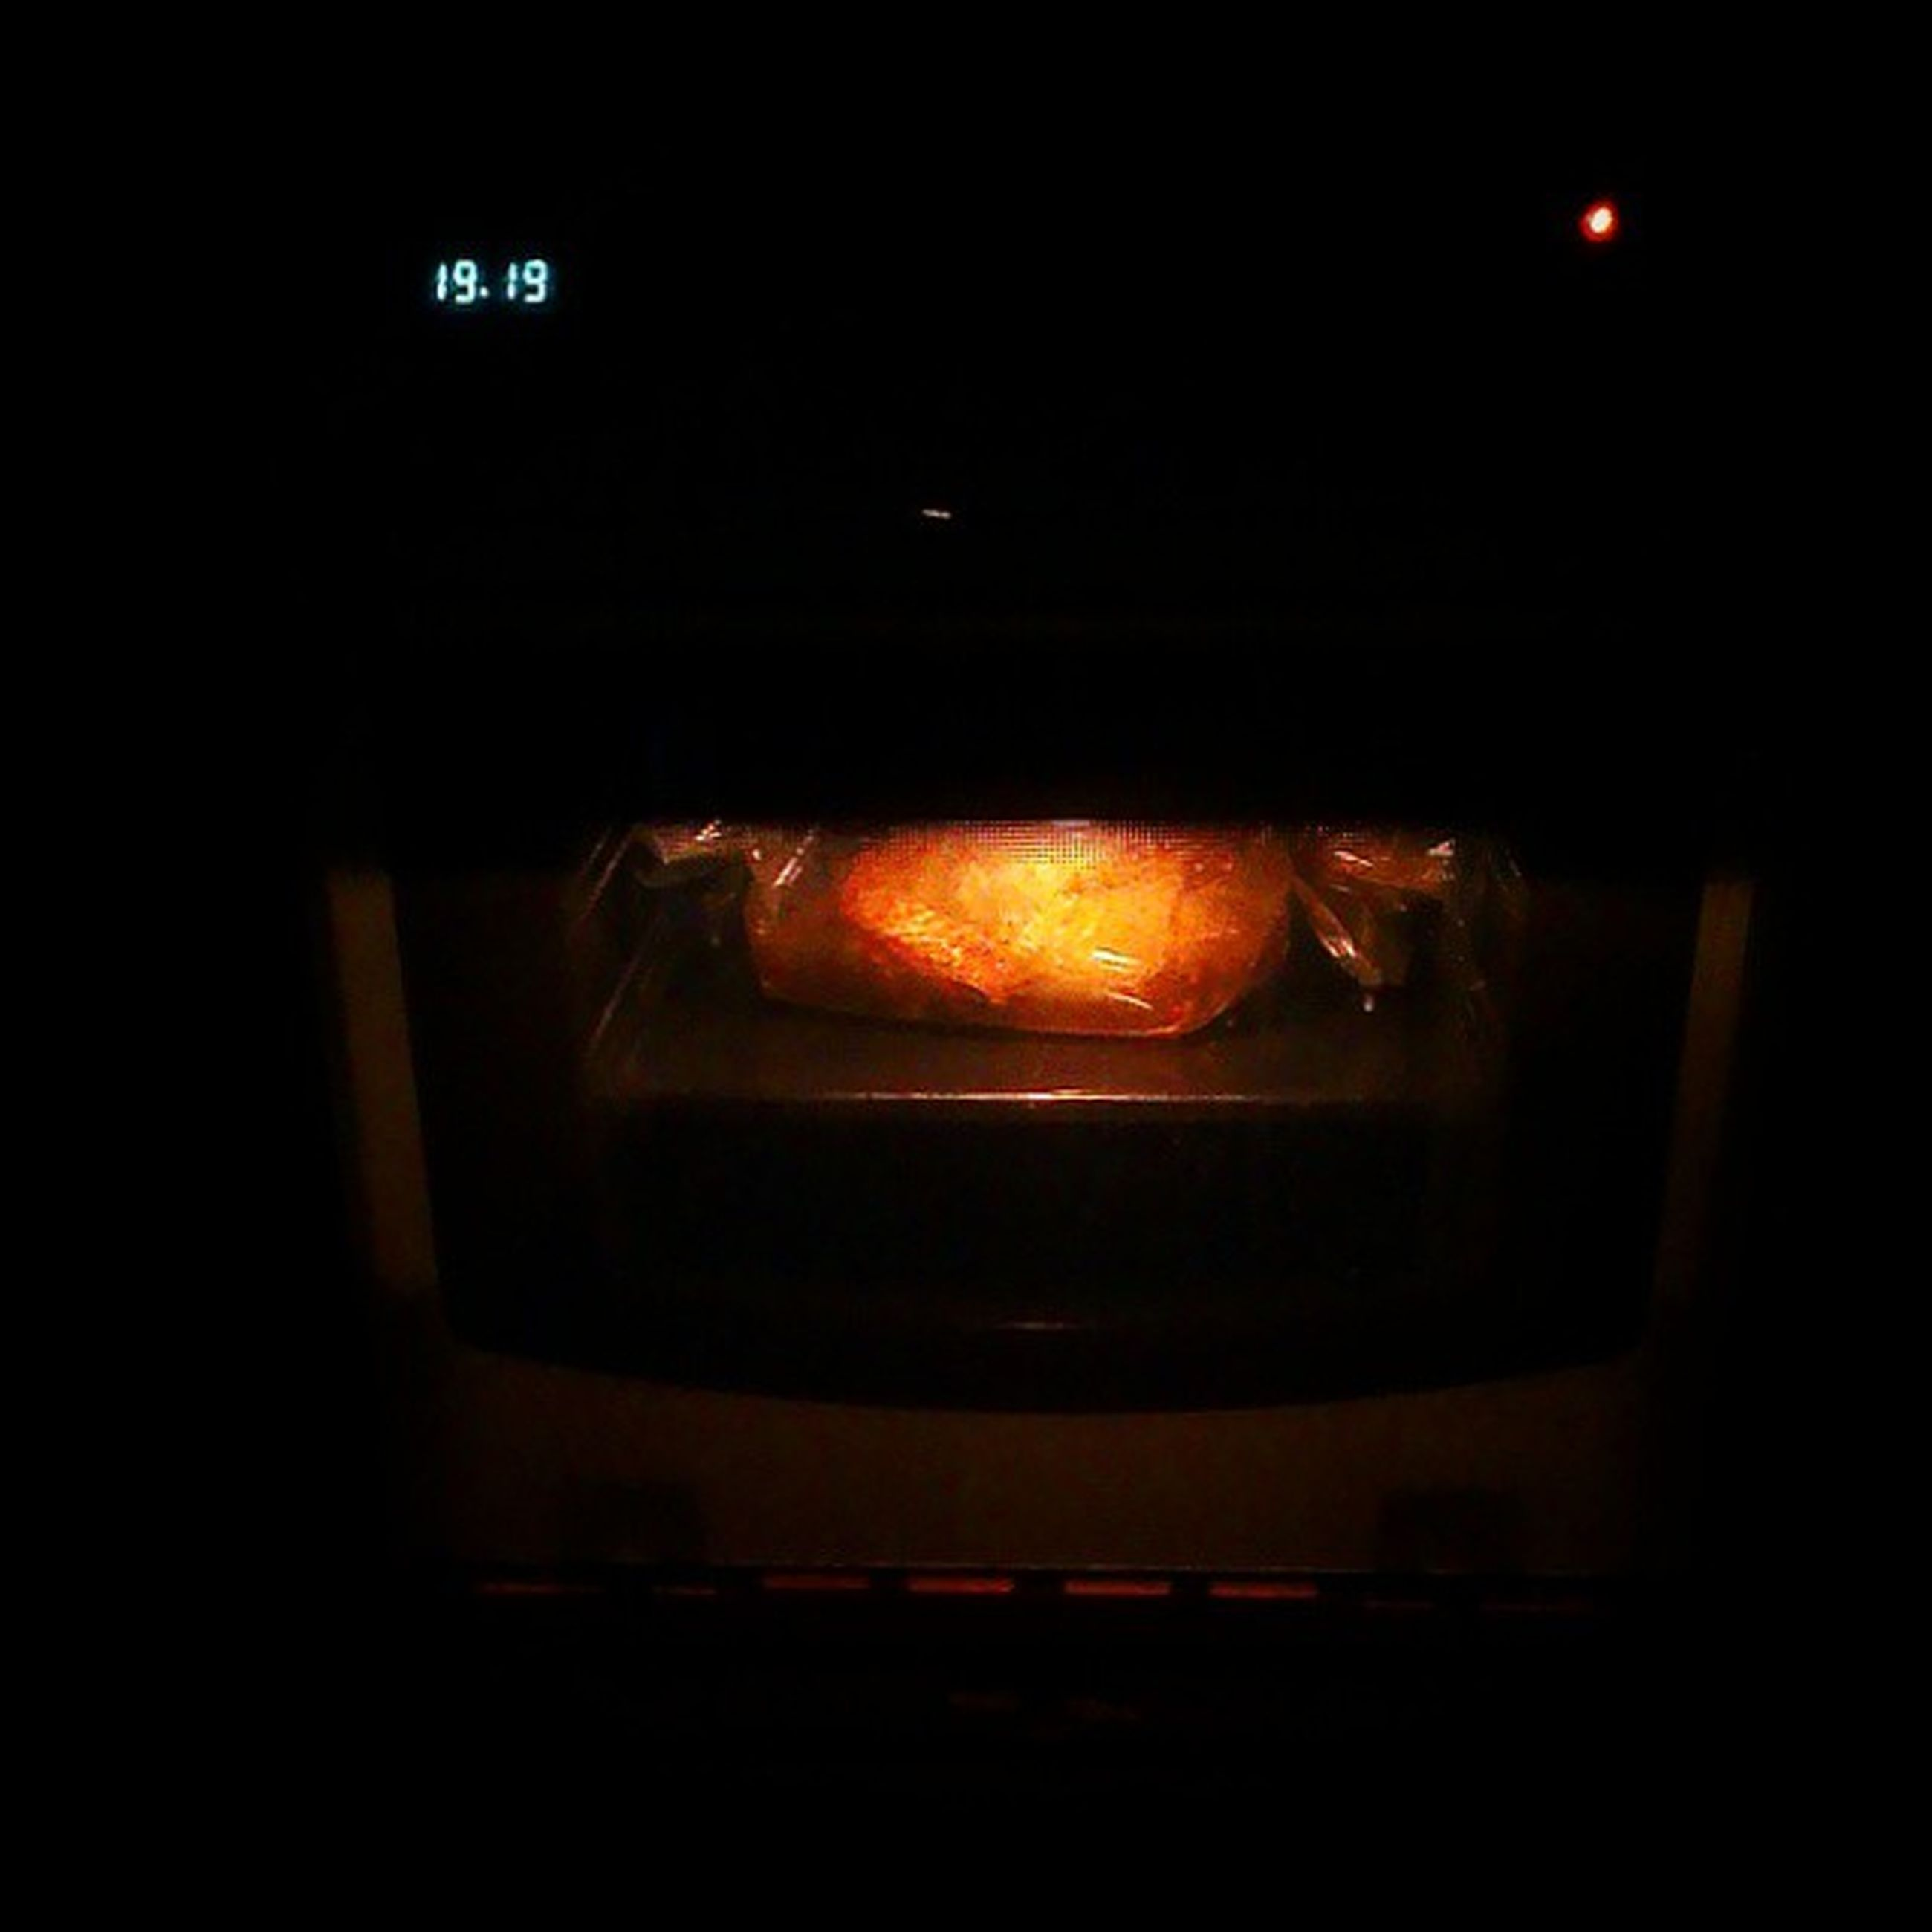 illuminated, night, indoors, dark, burning, flame, glowing, fire - natural phenomenon, window, heat - temperature, light - natural phenomenon, fire, glass - material, darkroom, no people, copy space, close-up, transparent, house, lit